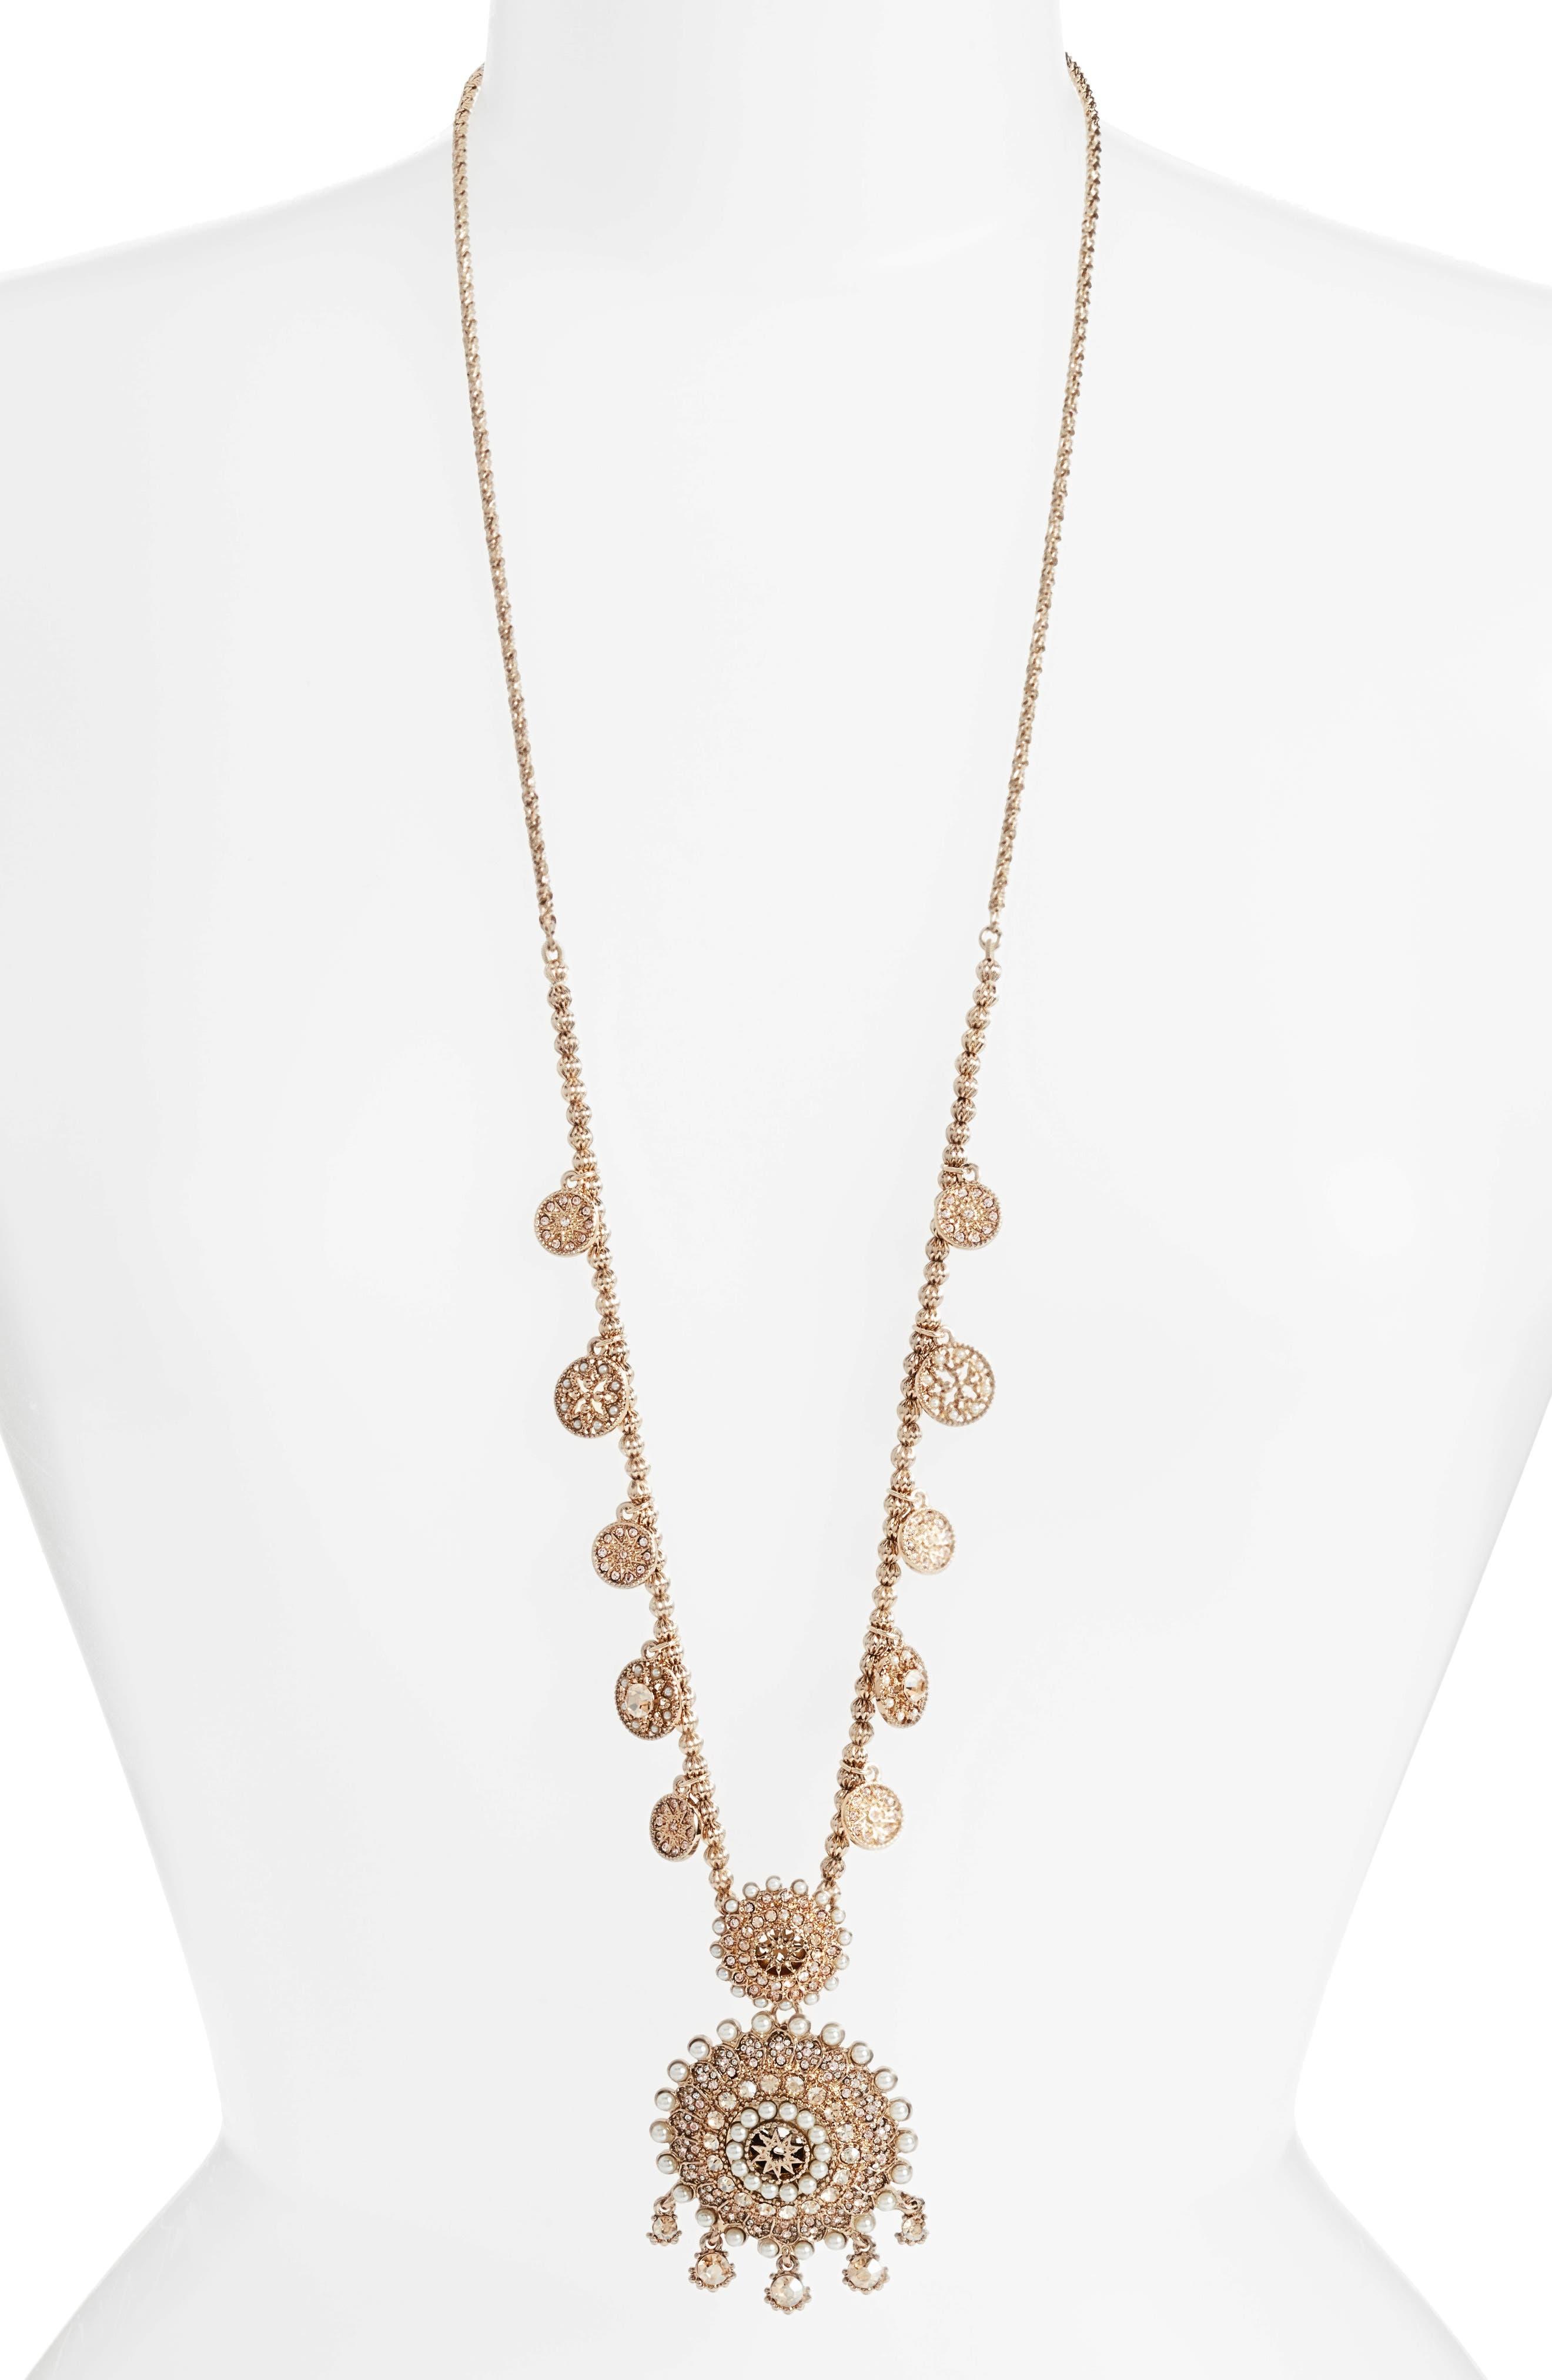 Main Image - Marchesa Pendant Necklace